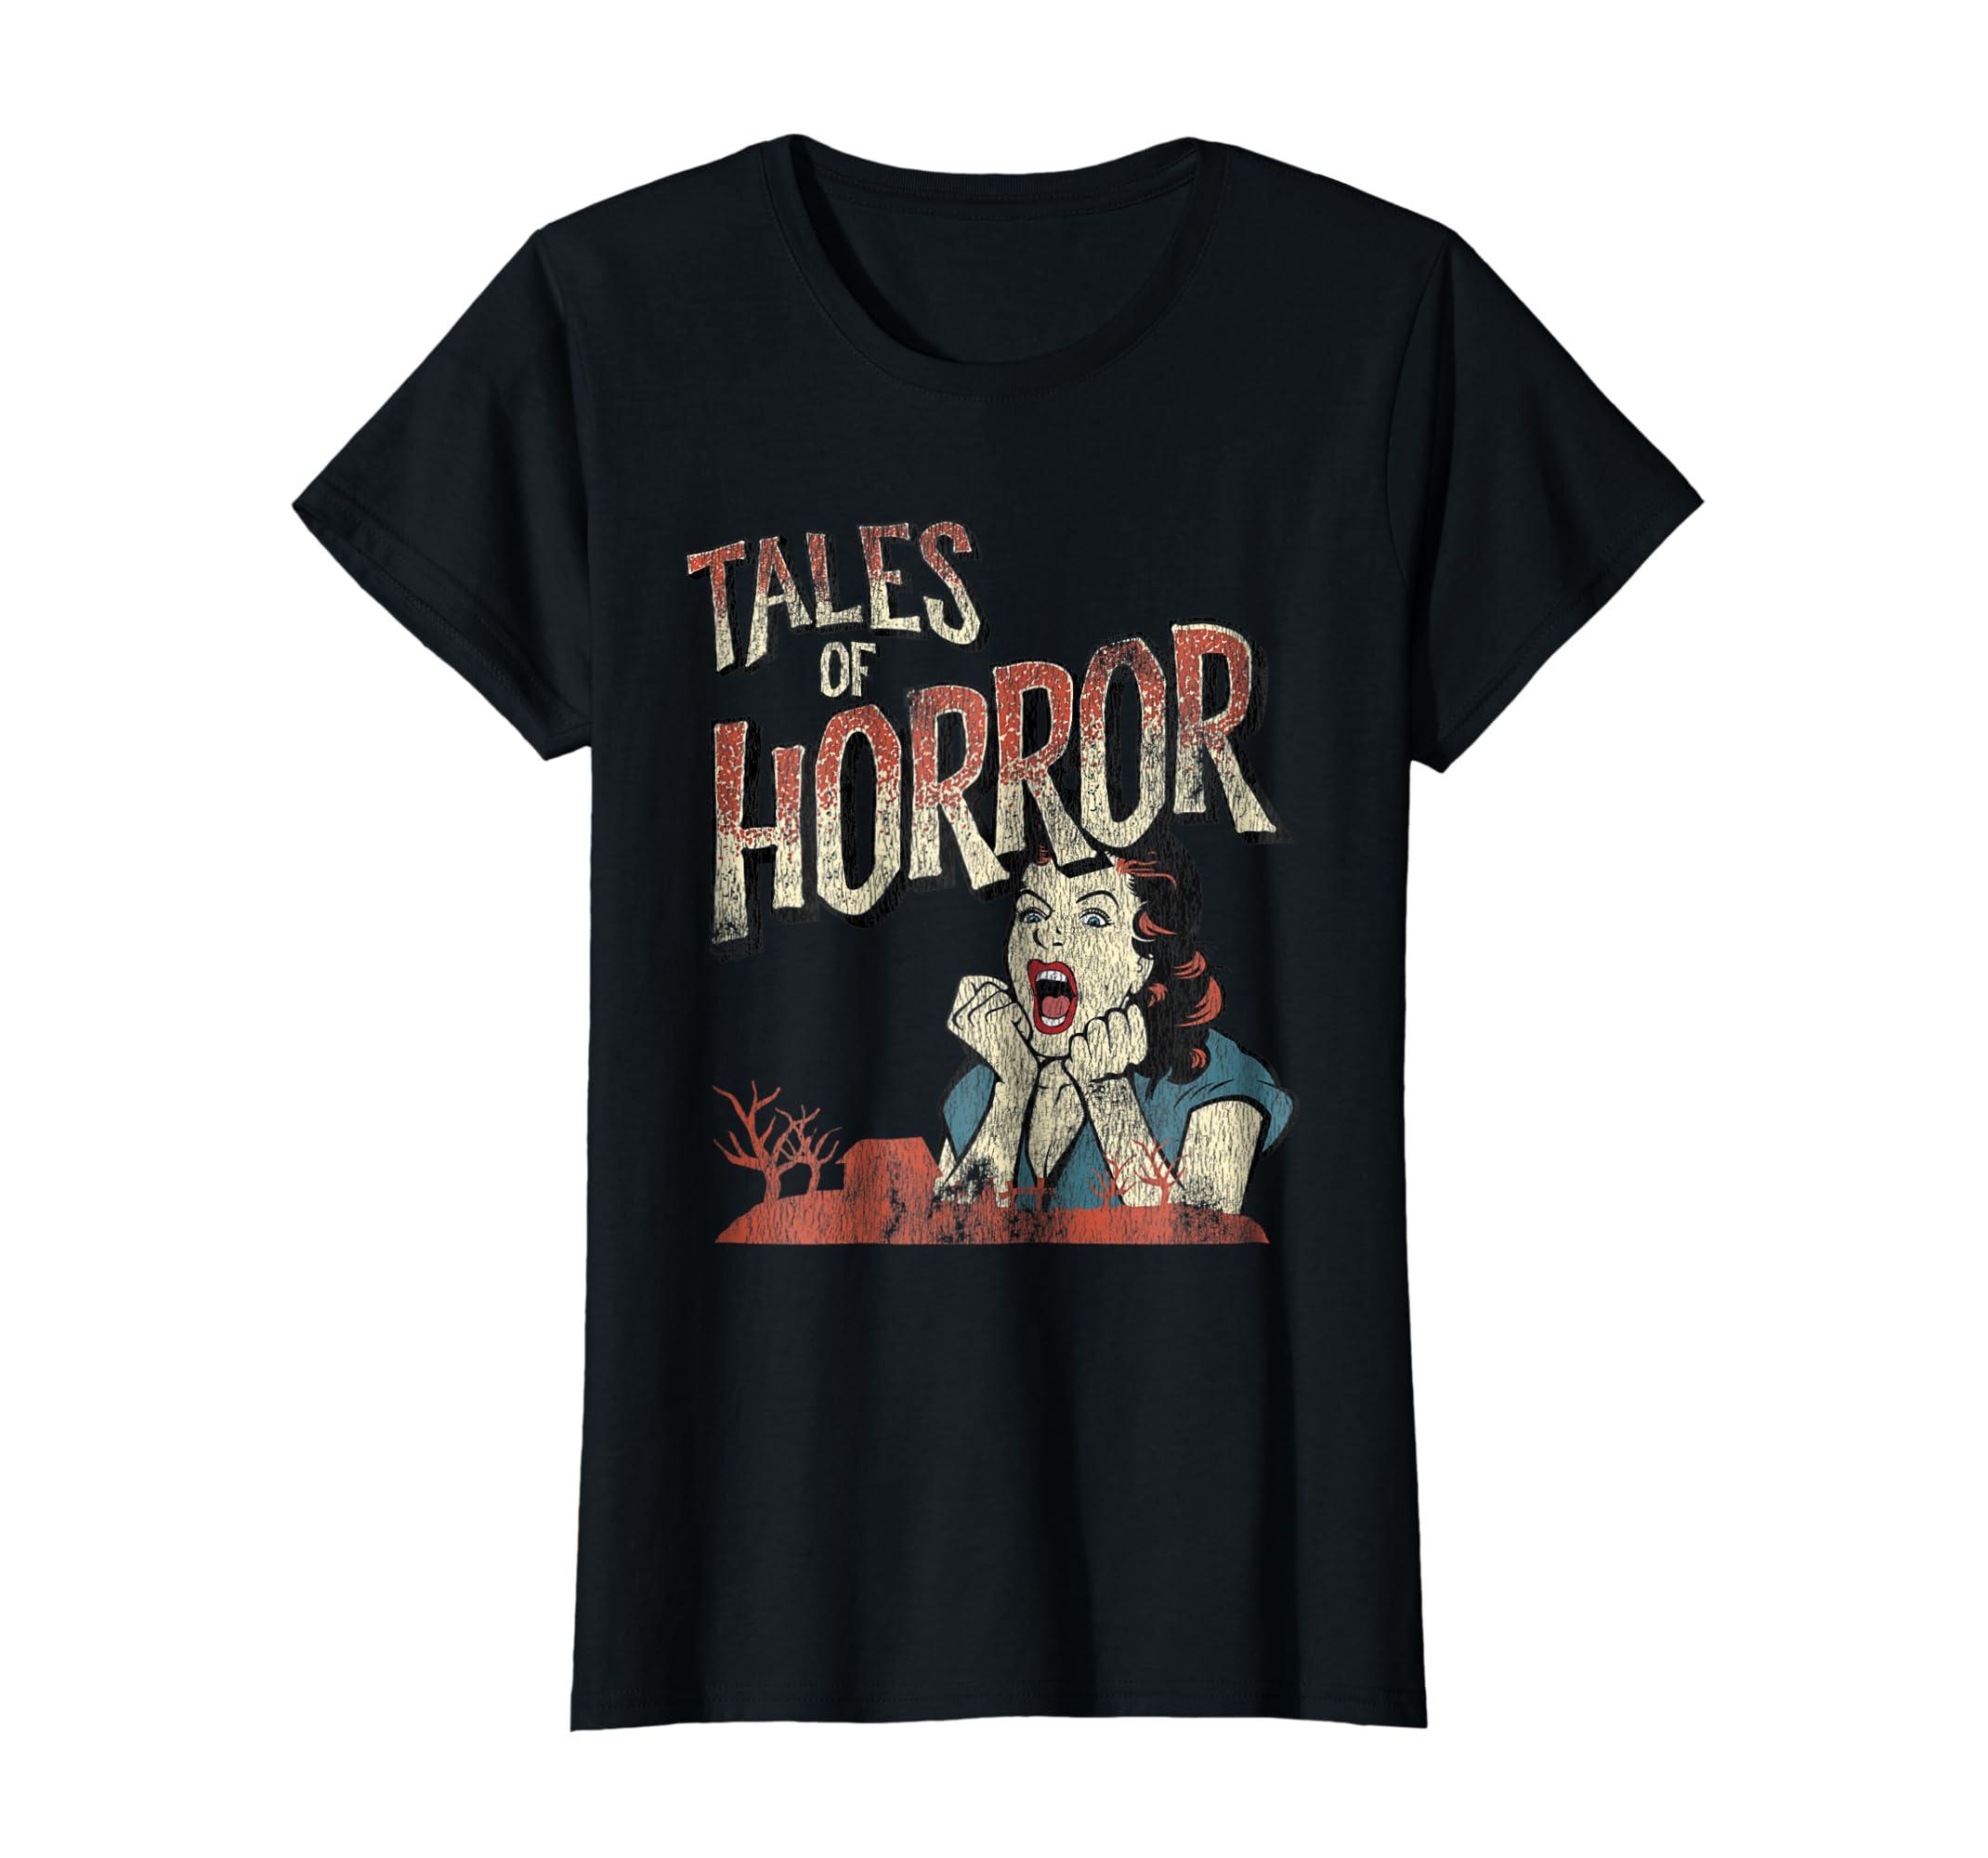 66348e47a9 Amazon.com: Vintage Horror Movie Poster Shirt Funny Halloween Shirt:  Clothing